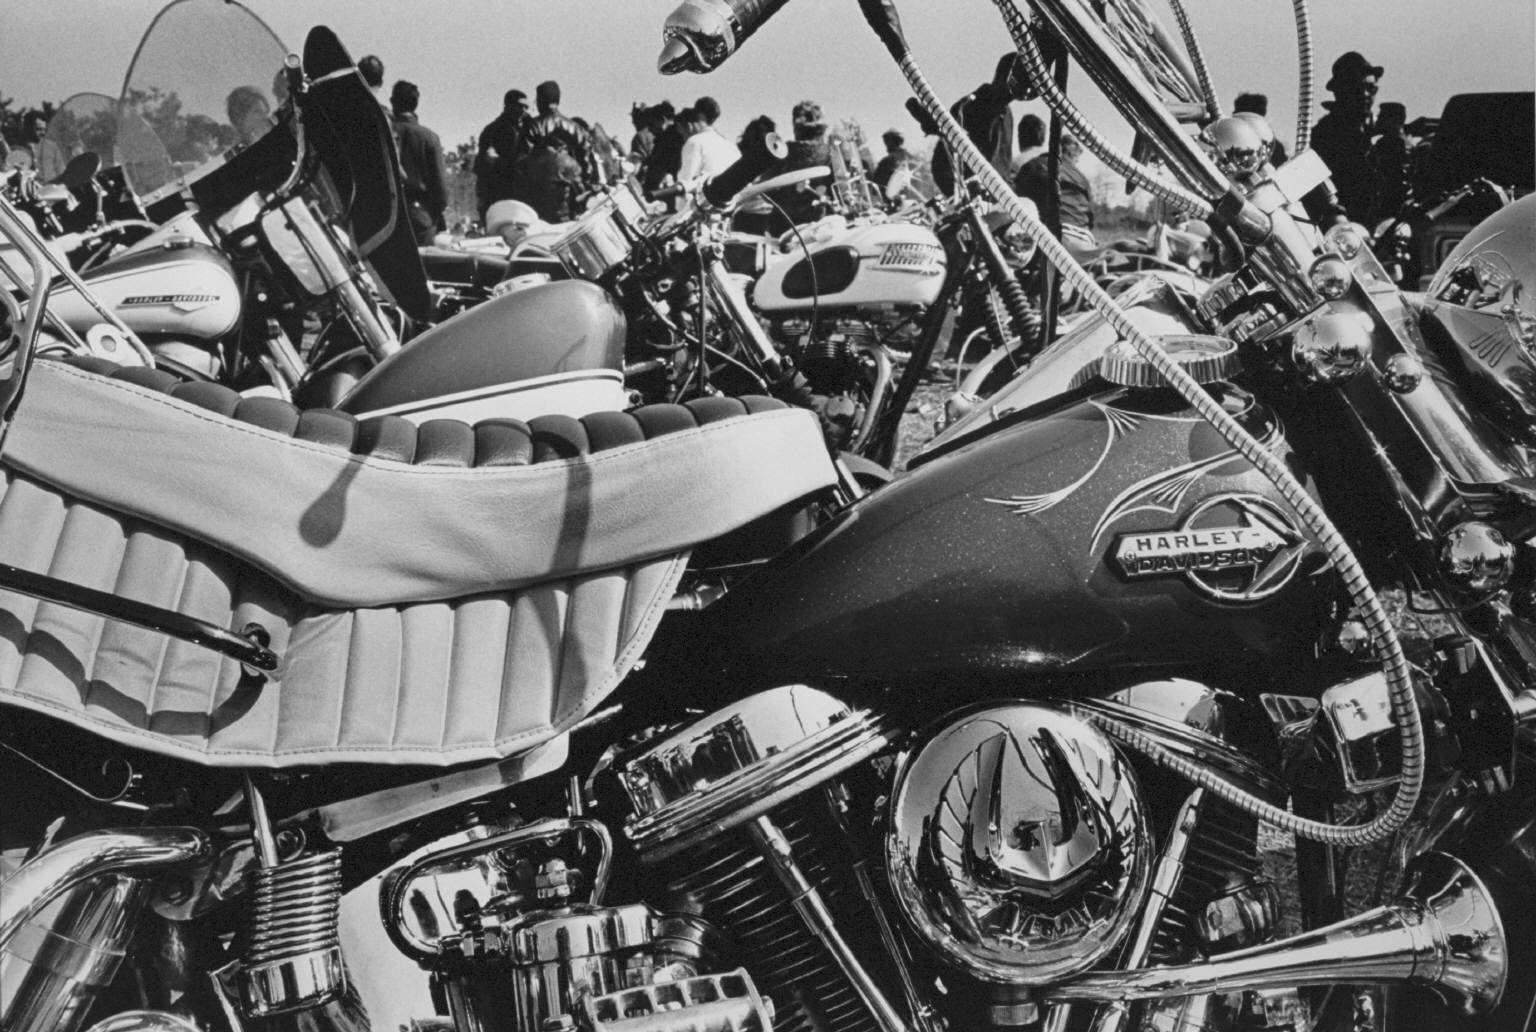 """Field meet, Long Island, New York"" from The Bikeriders by Danny Lyon  --circa 1963-66."